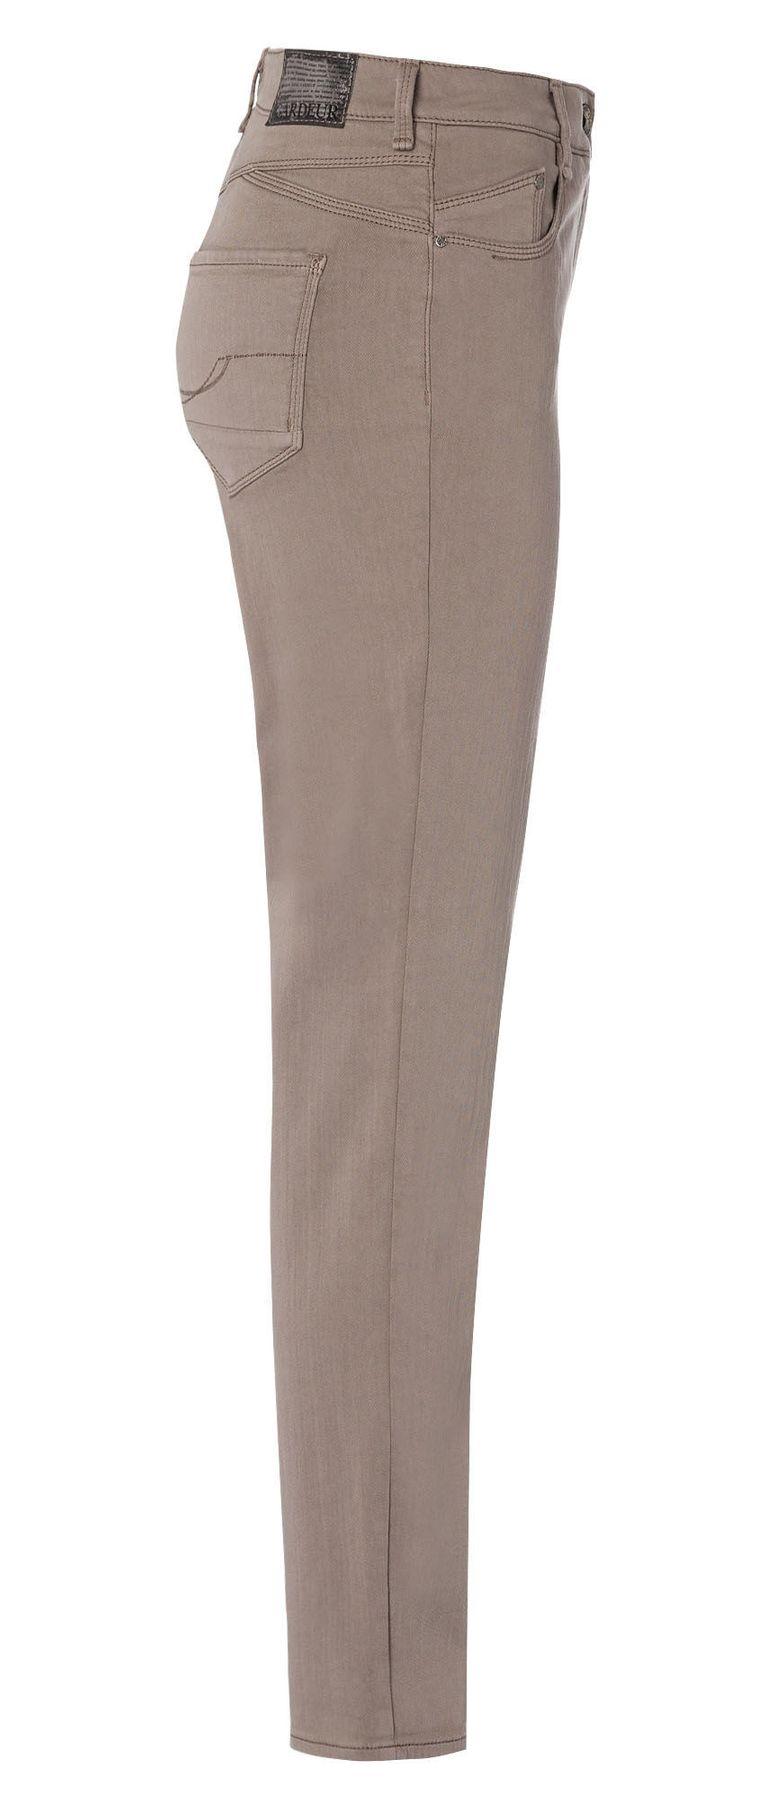 Atelier Gardeur - Feminine Fit - Damen 5-Pocket Hose aus Baumwollstretch, Ciara (080151) – Bild 2